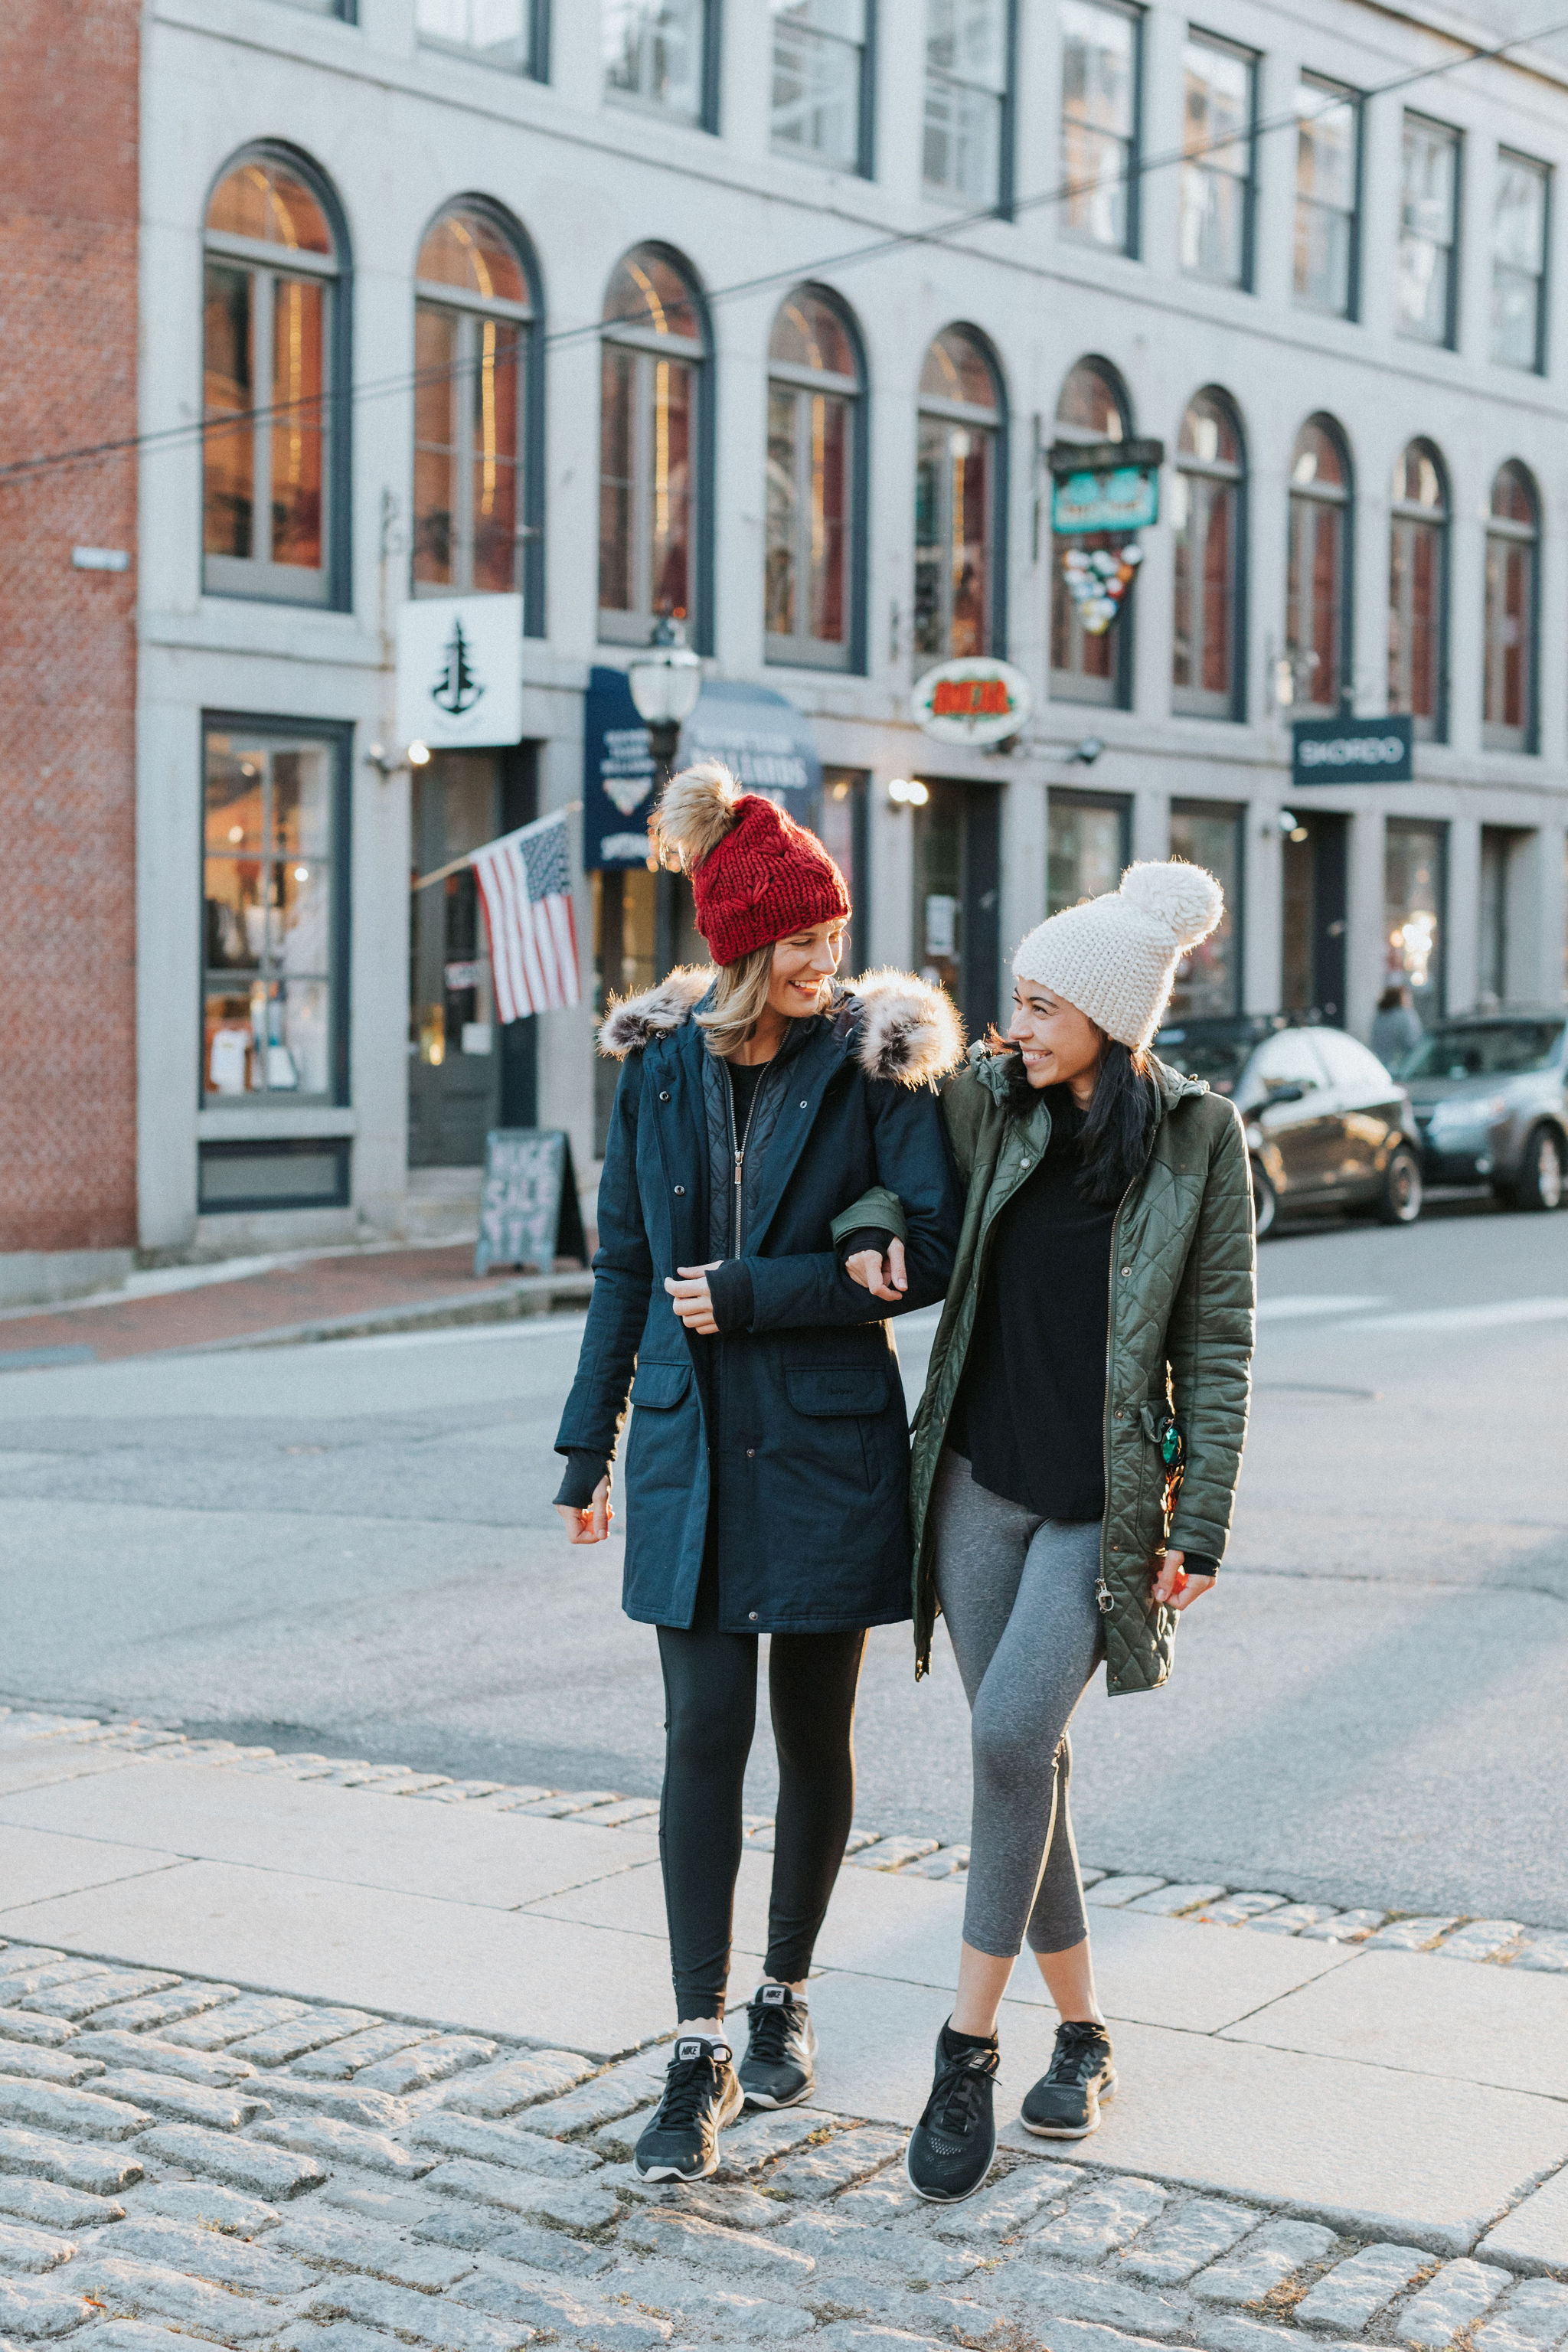 Leyland_Athleisure_Fashion_Maine_Holiday_2018-050.jpg